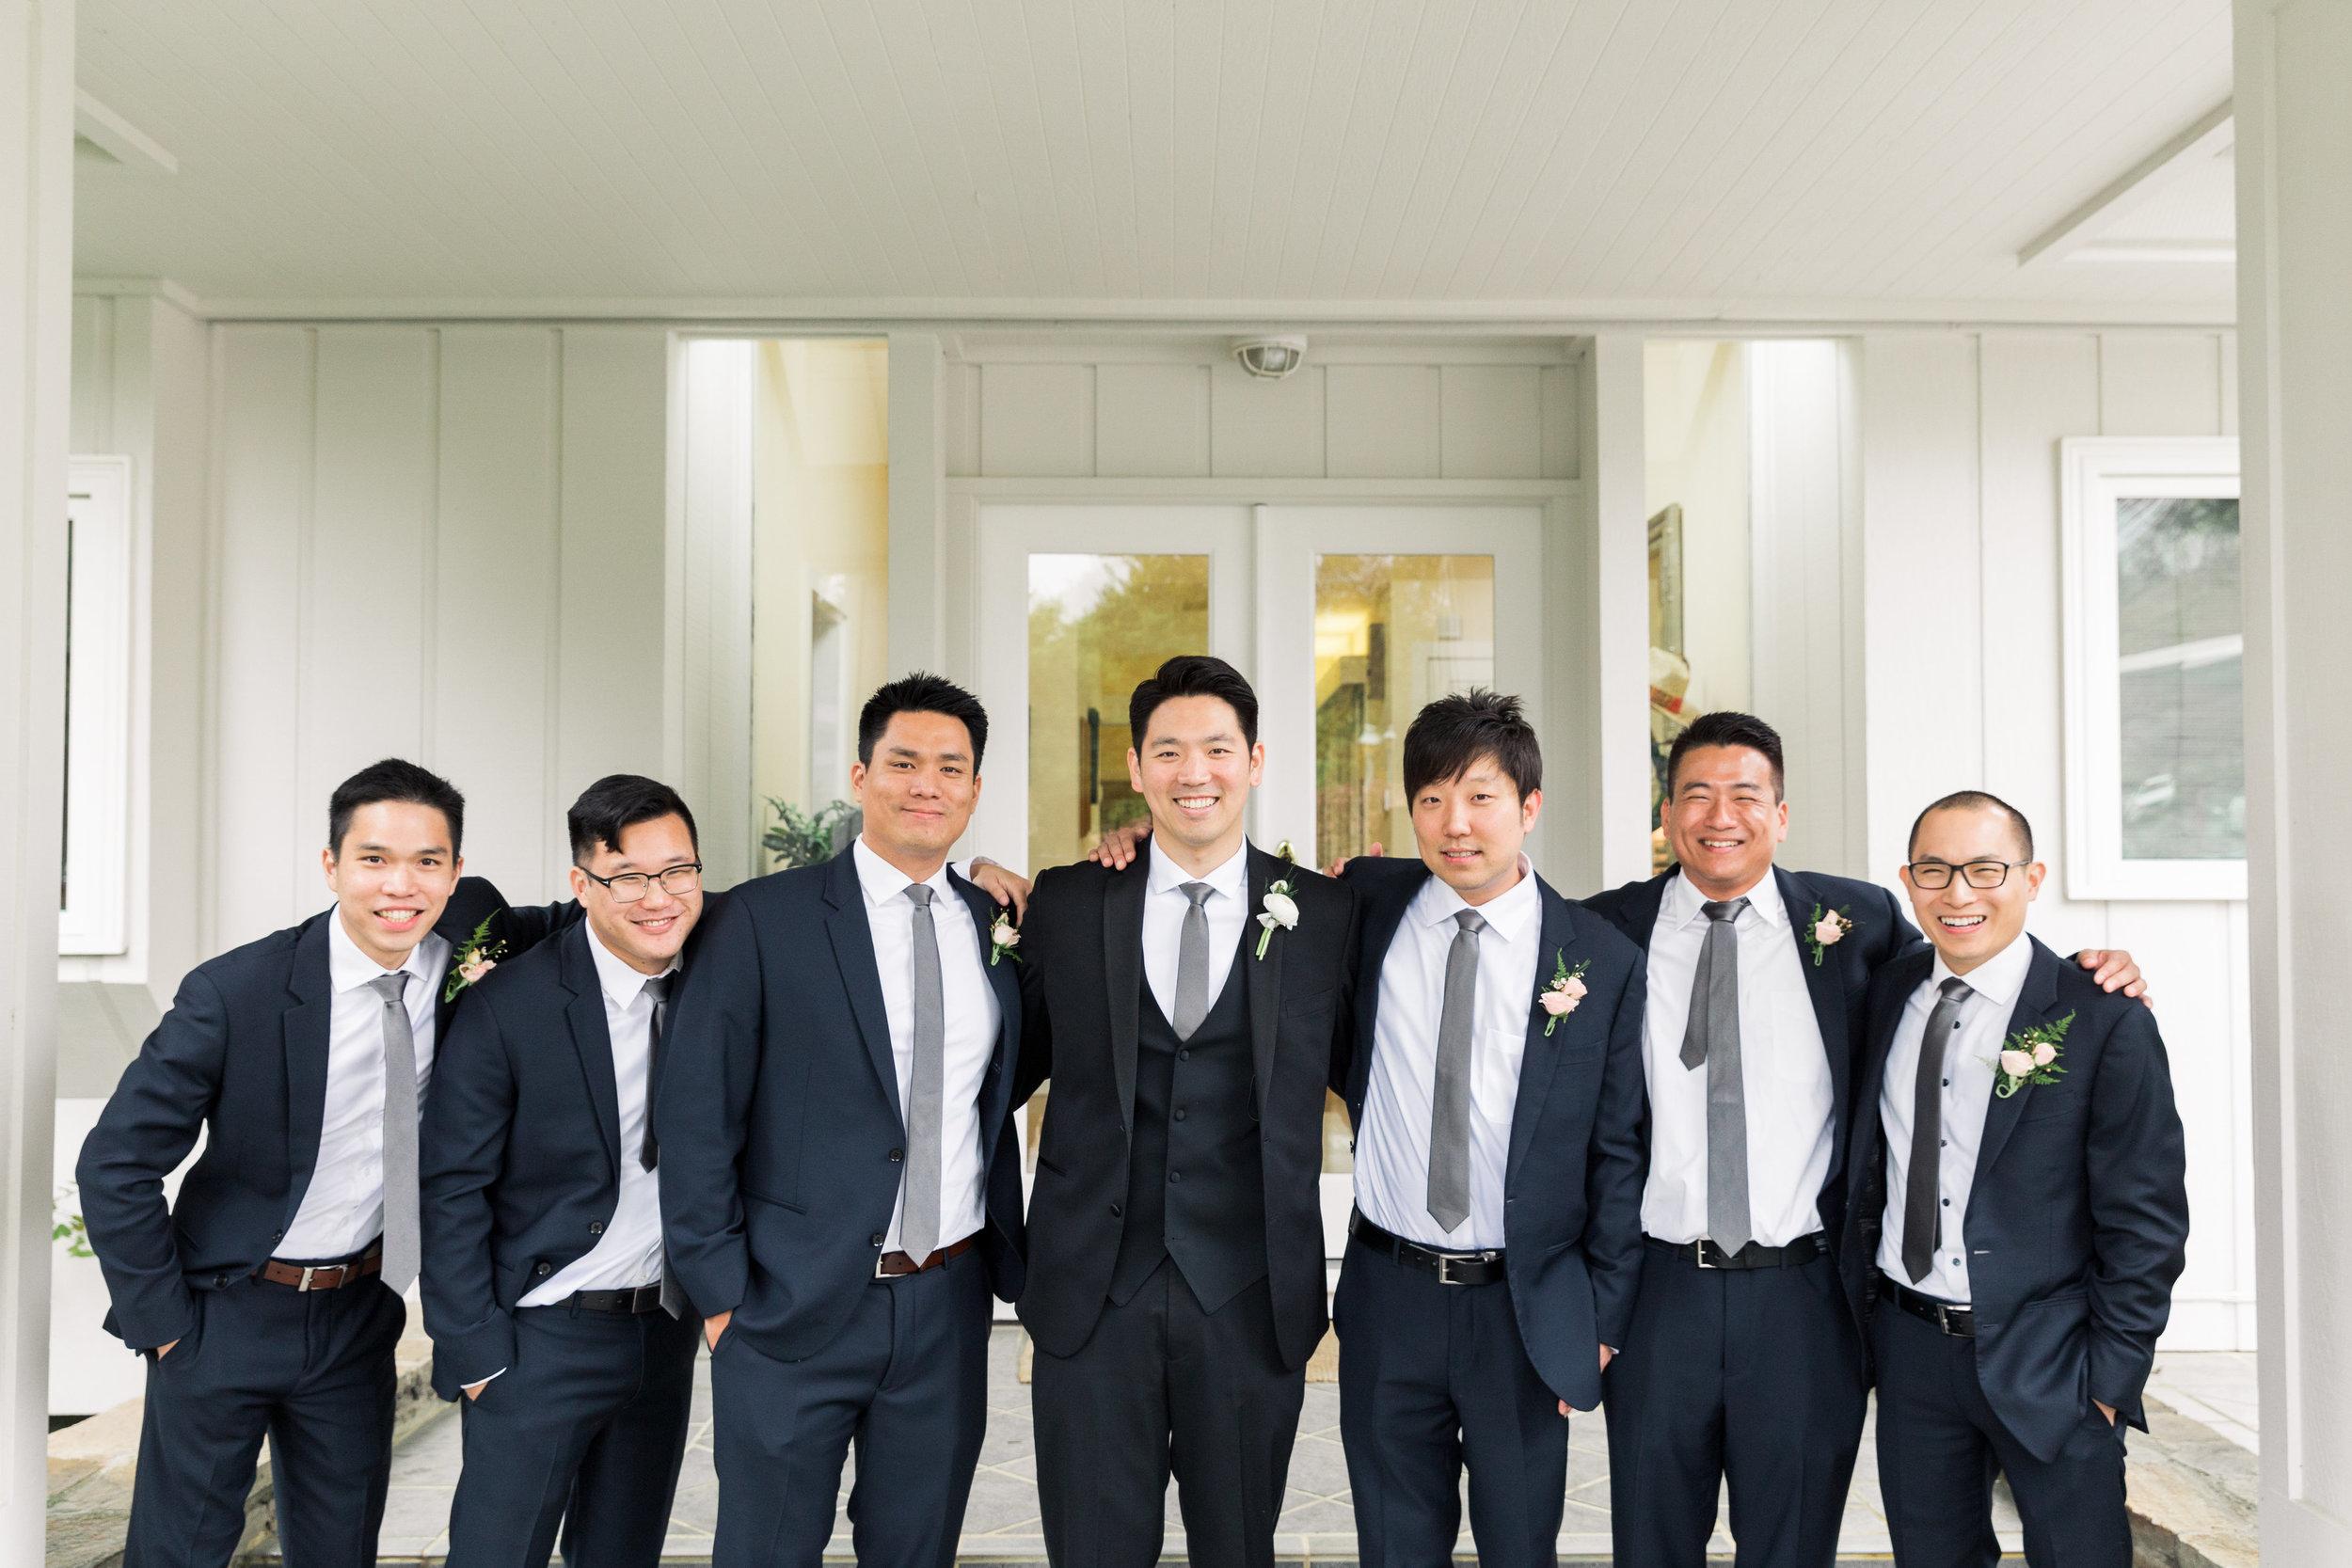 JA_Wedding_Aaron_Groomsmen_014.jpg